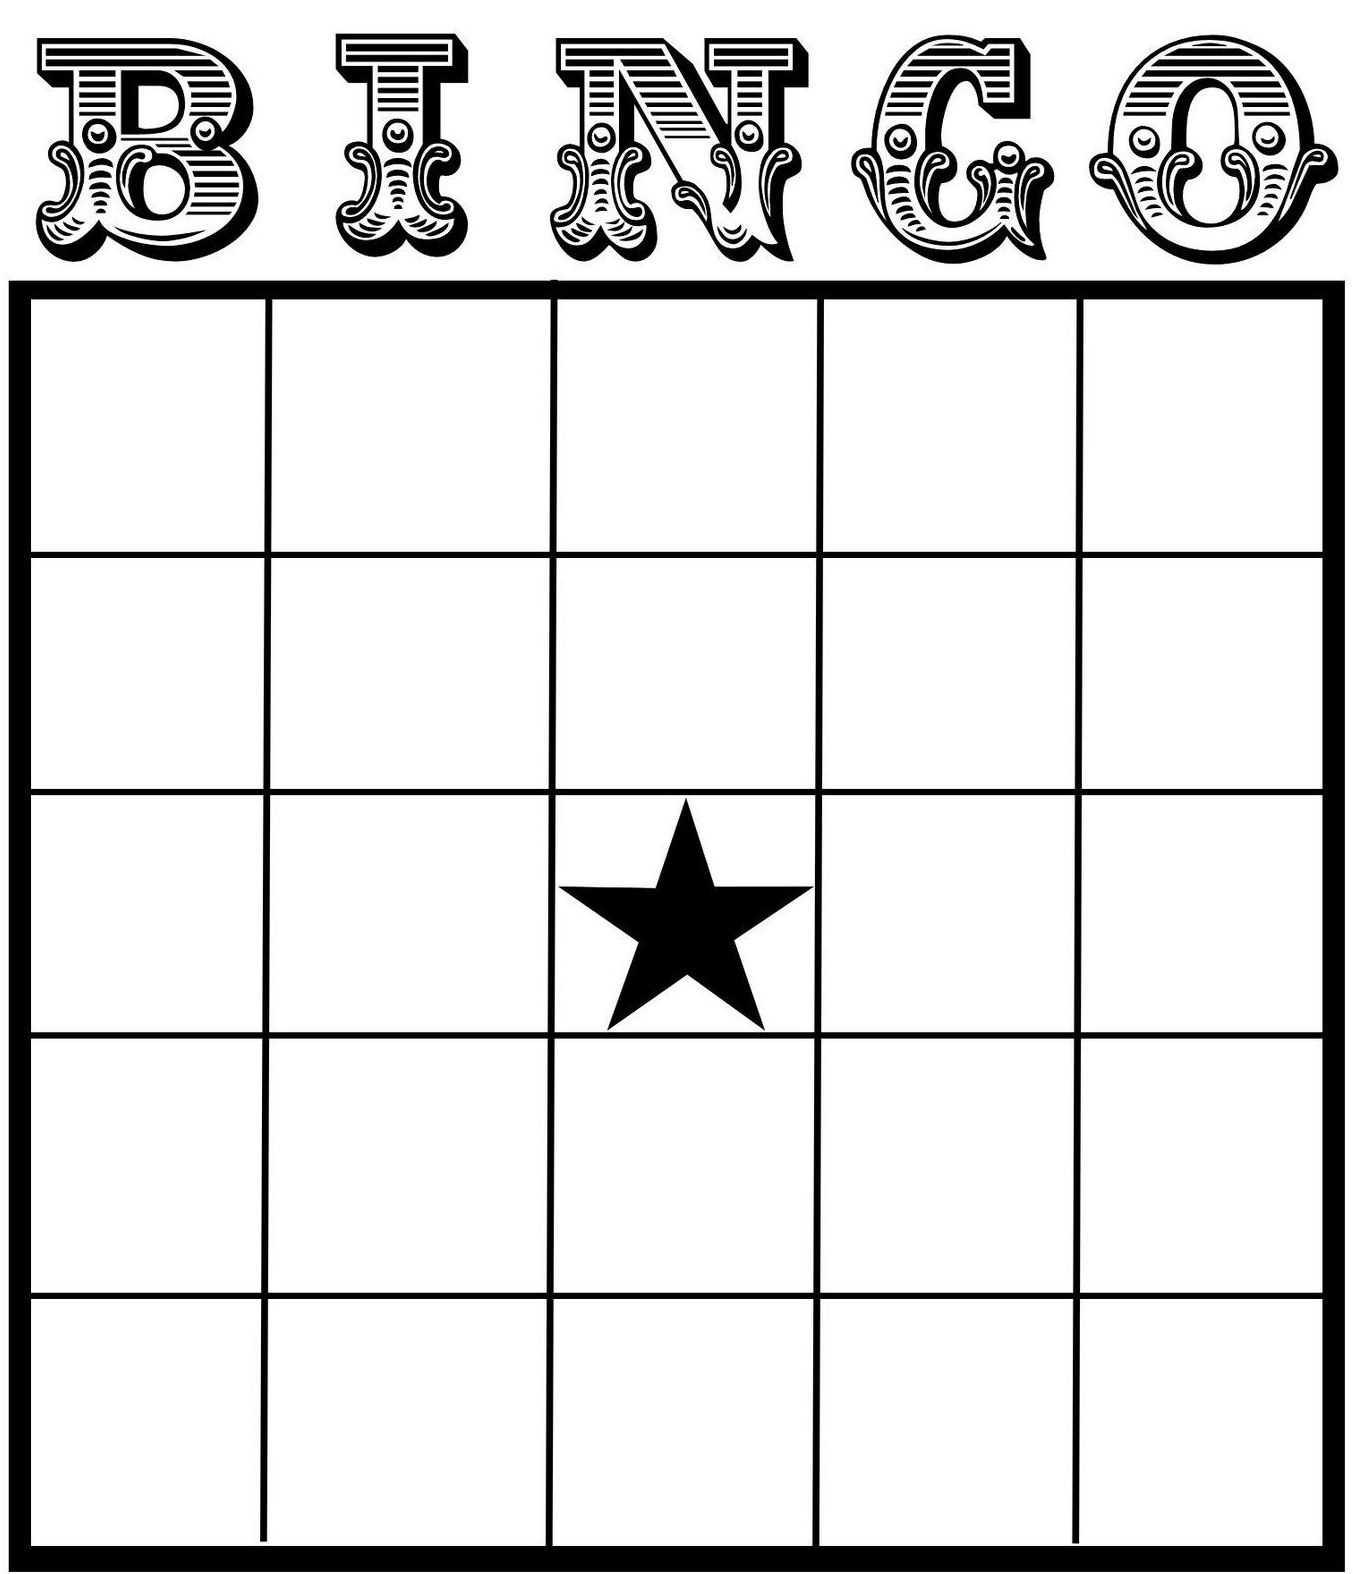 Free Printable Bingo Card Template - Set Your Plan & Tasks Inside Blank Bingo Card Template Microsoft Word